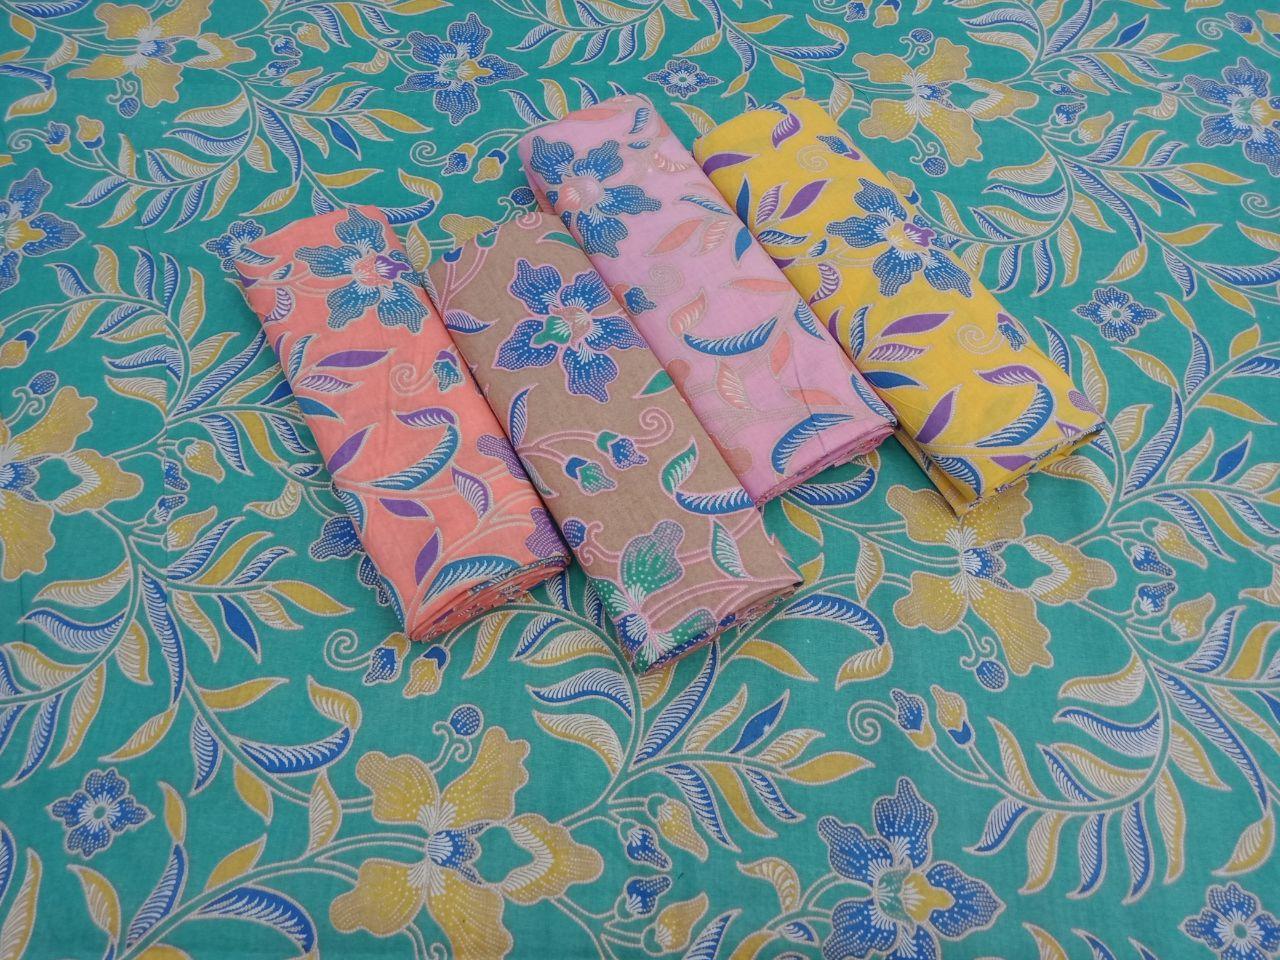 Kain Batik Pekalongan Motif Bunga Warna Pastel – P3-9